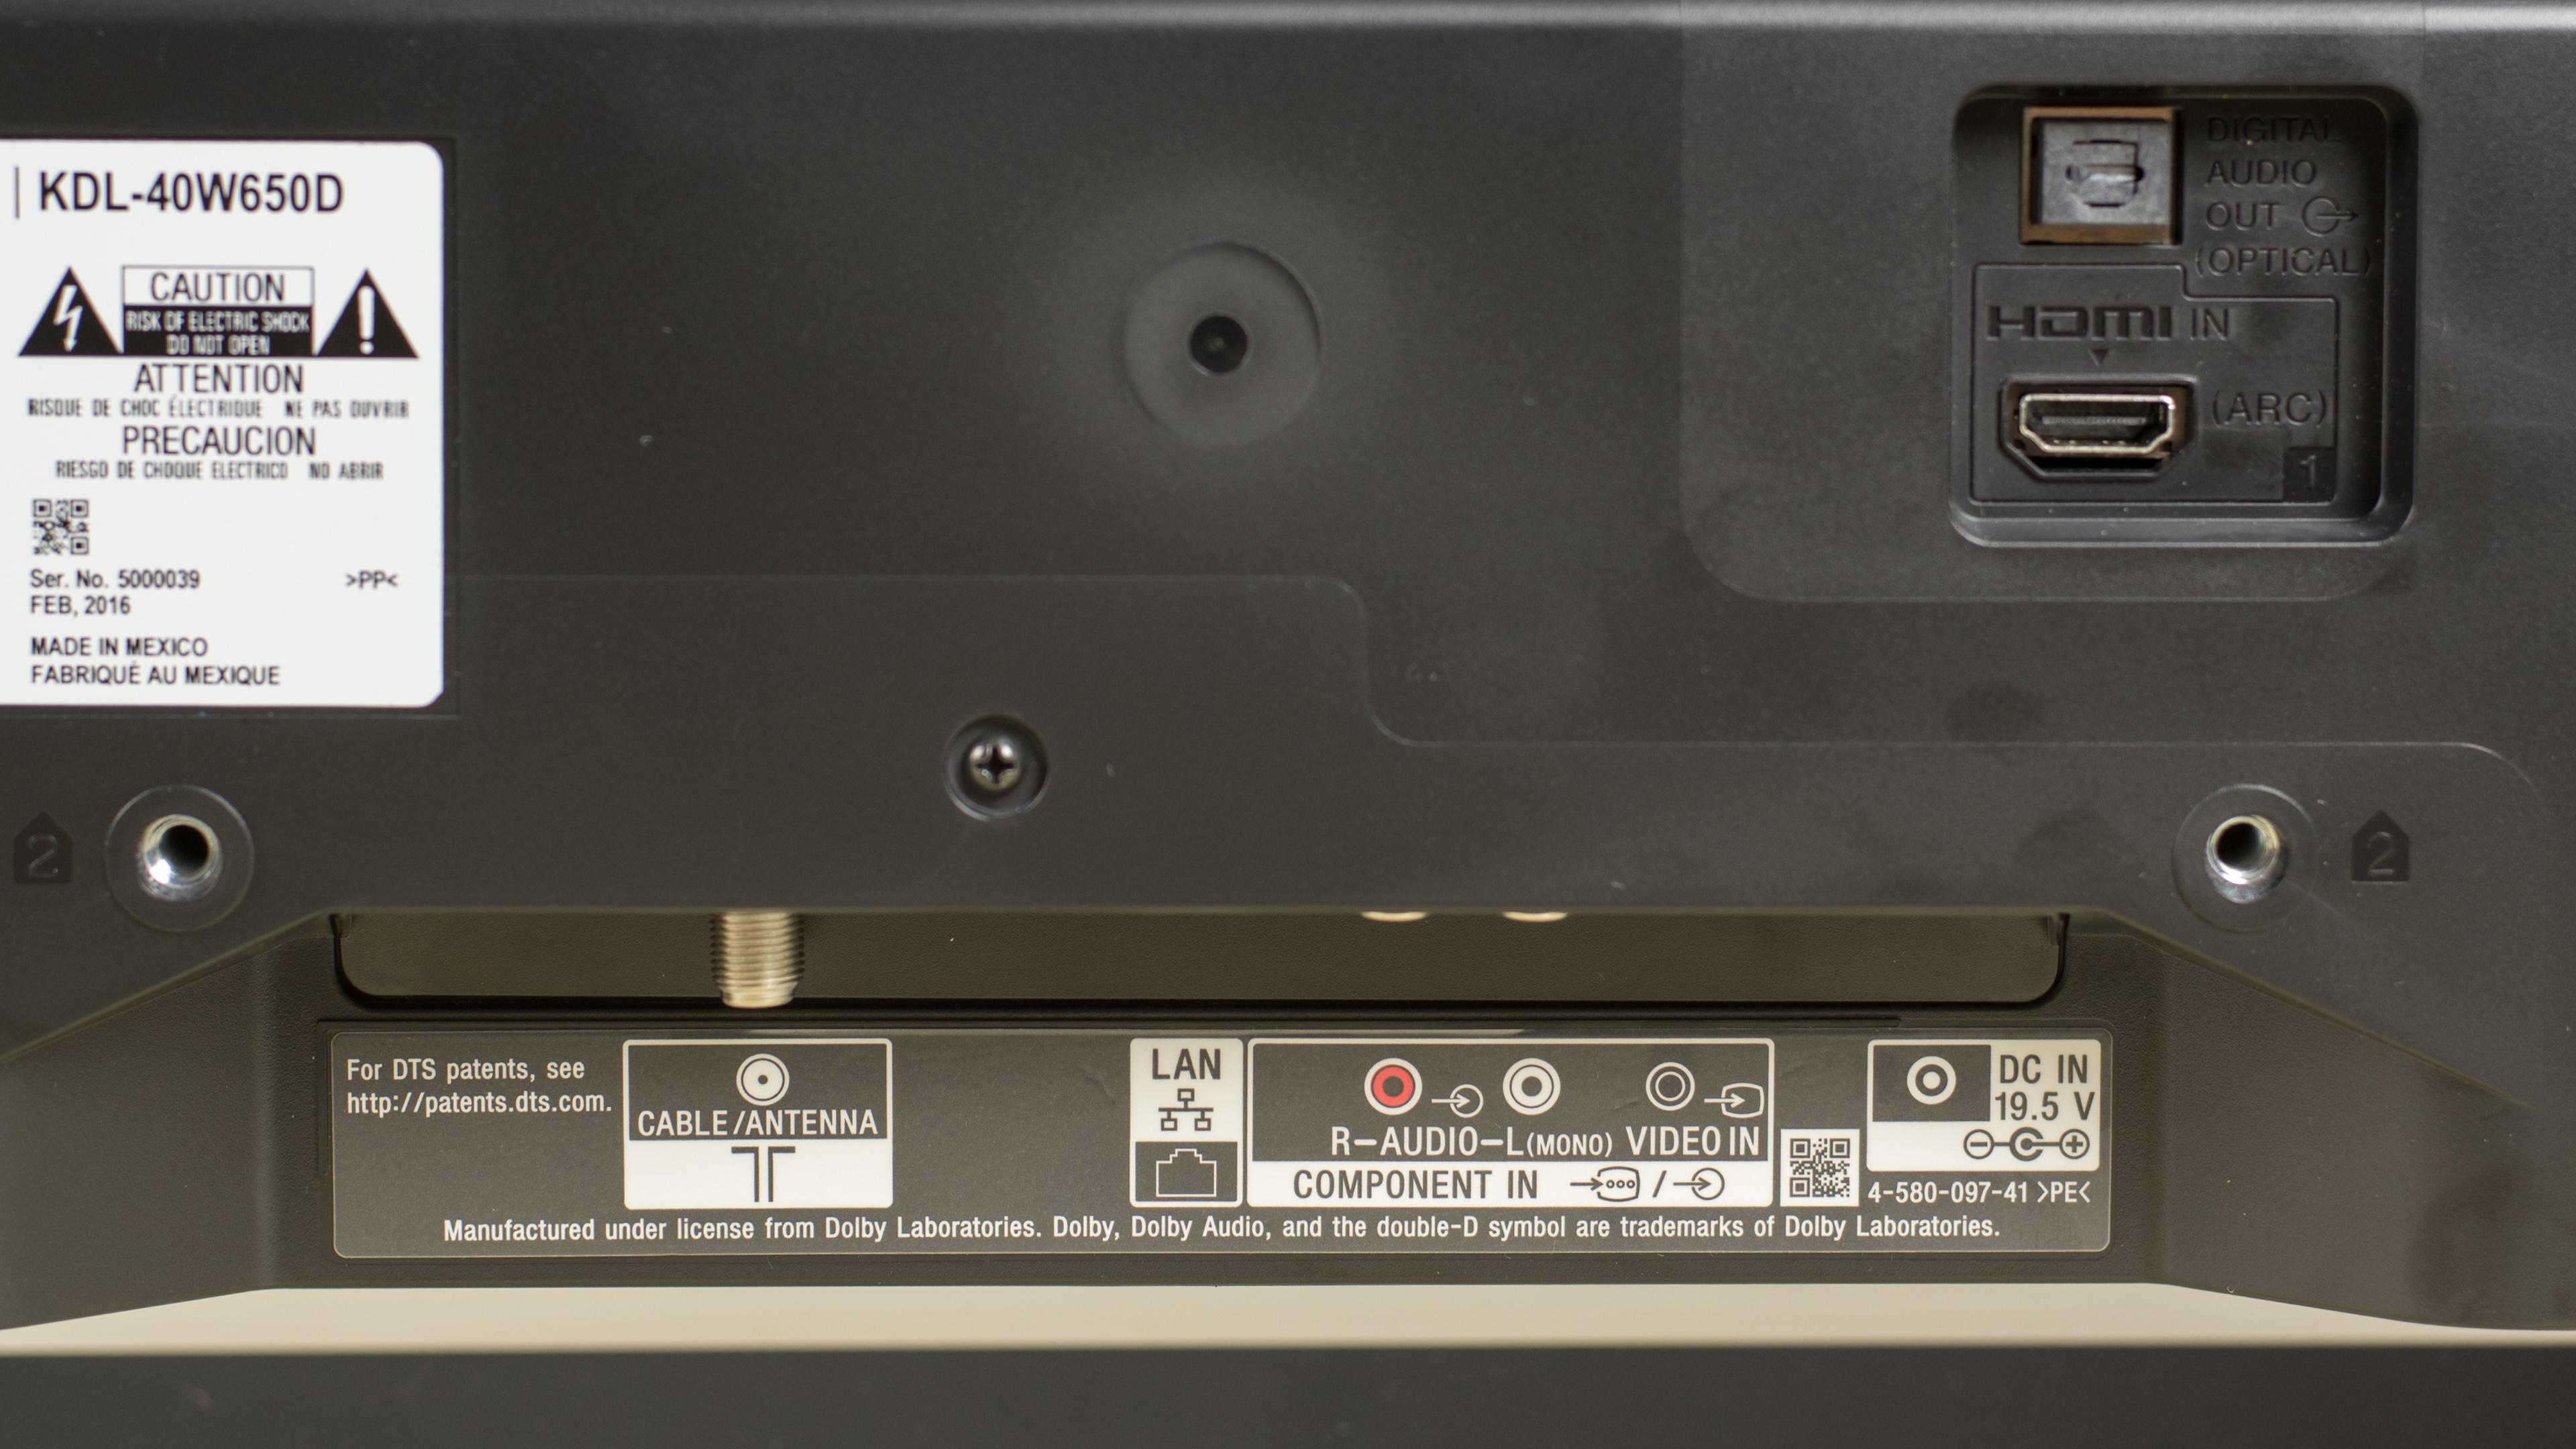 Sony W650d Review Kdl40w650d Kdl48w650d Kdl55w650d